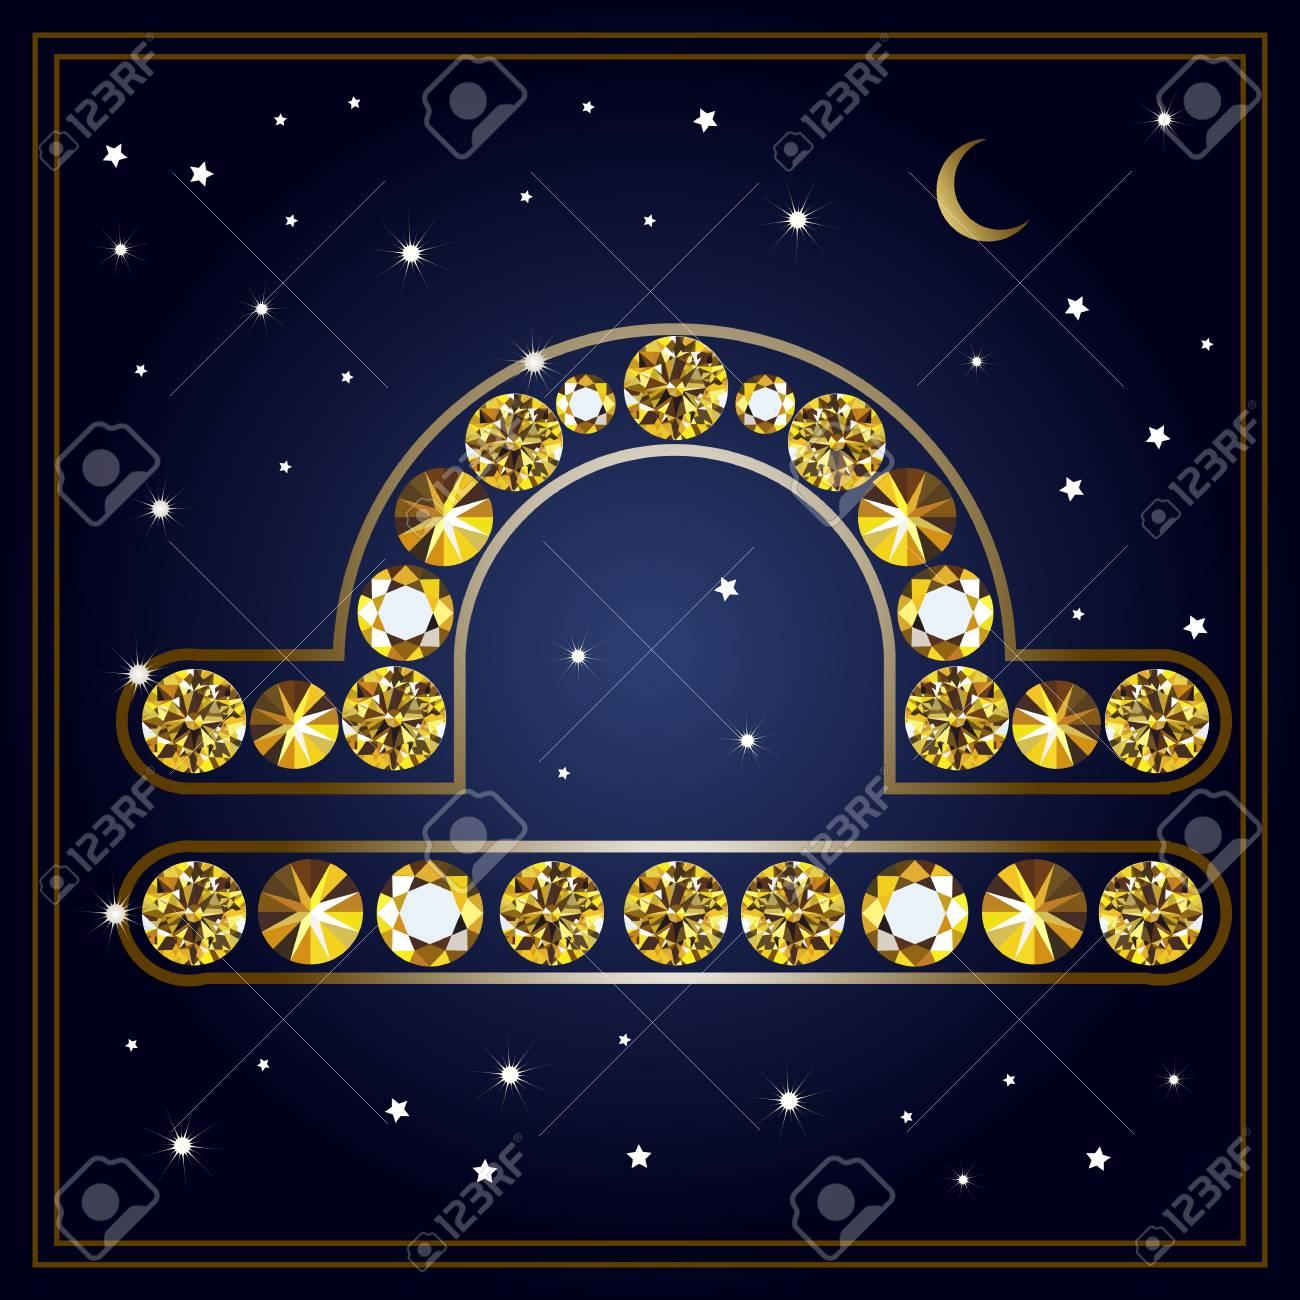 sun sign libra horoscope